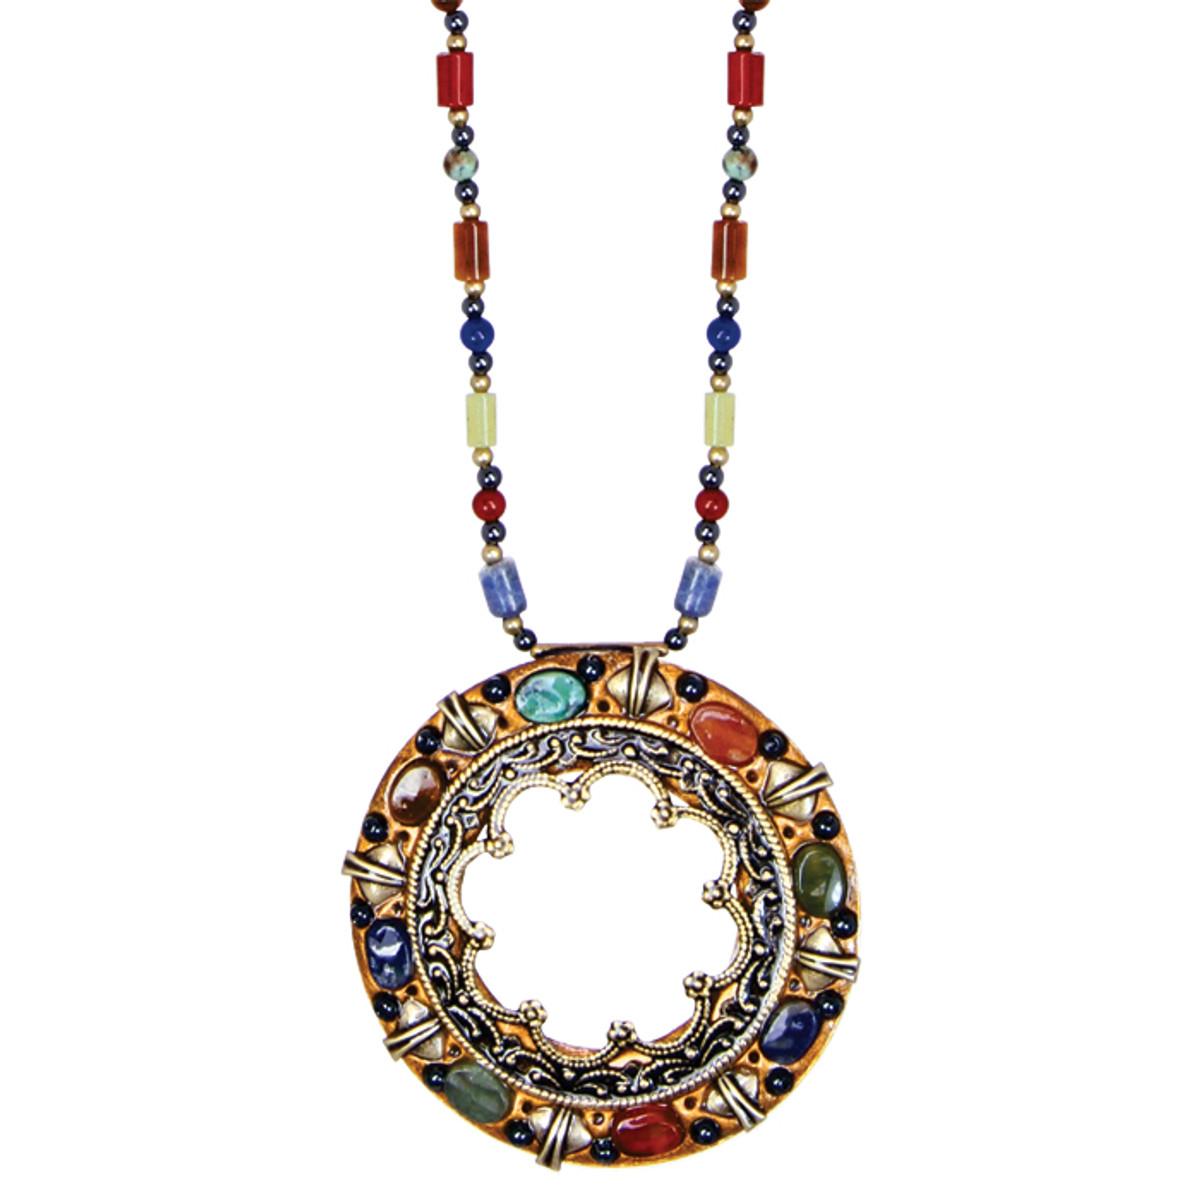 Michal Golan Necklace - Durango Large Open Circle